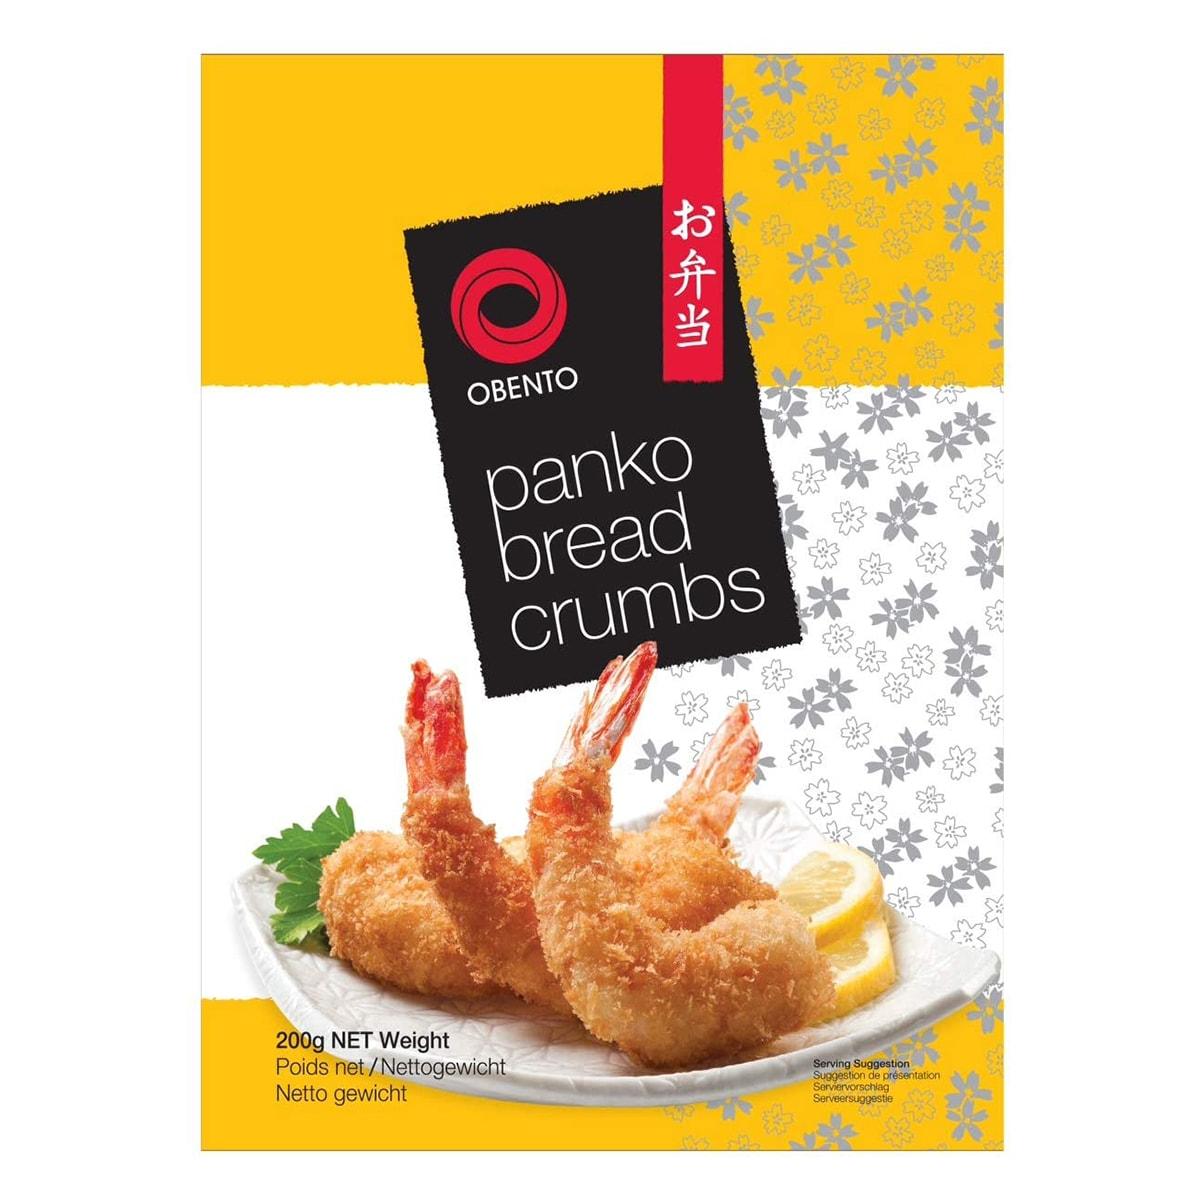 Buy Obento Panko Bread Crumbs - 200 gm